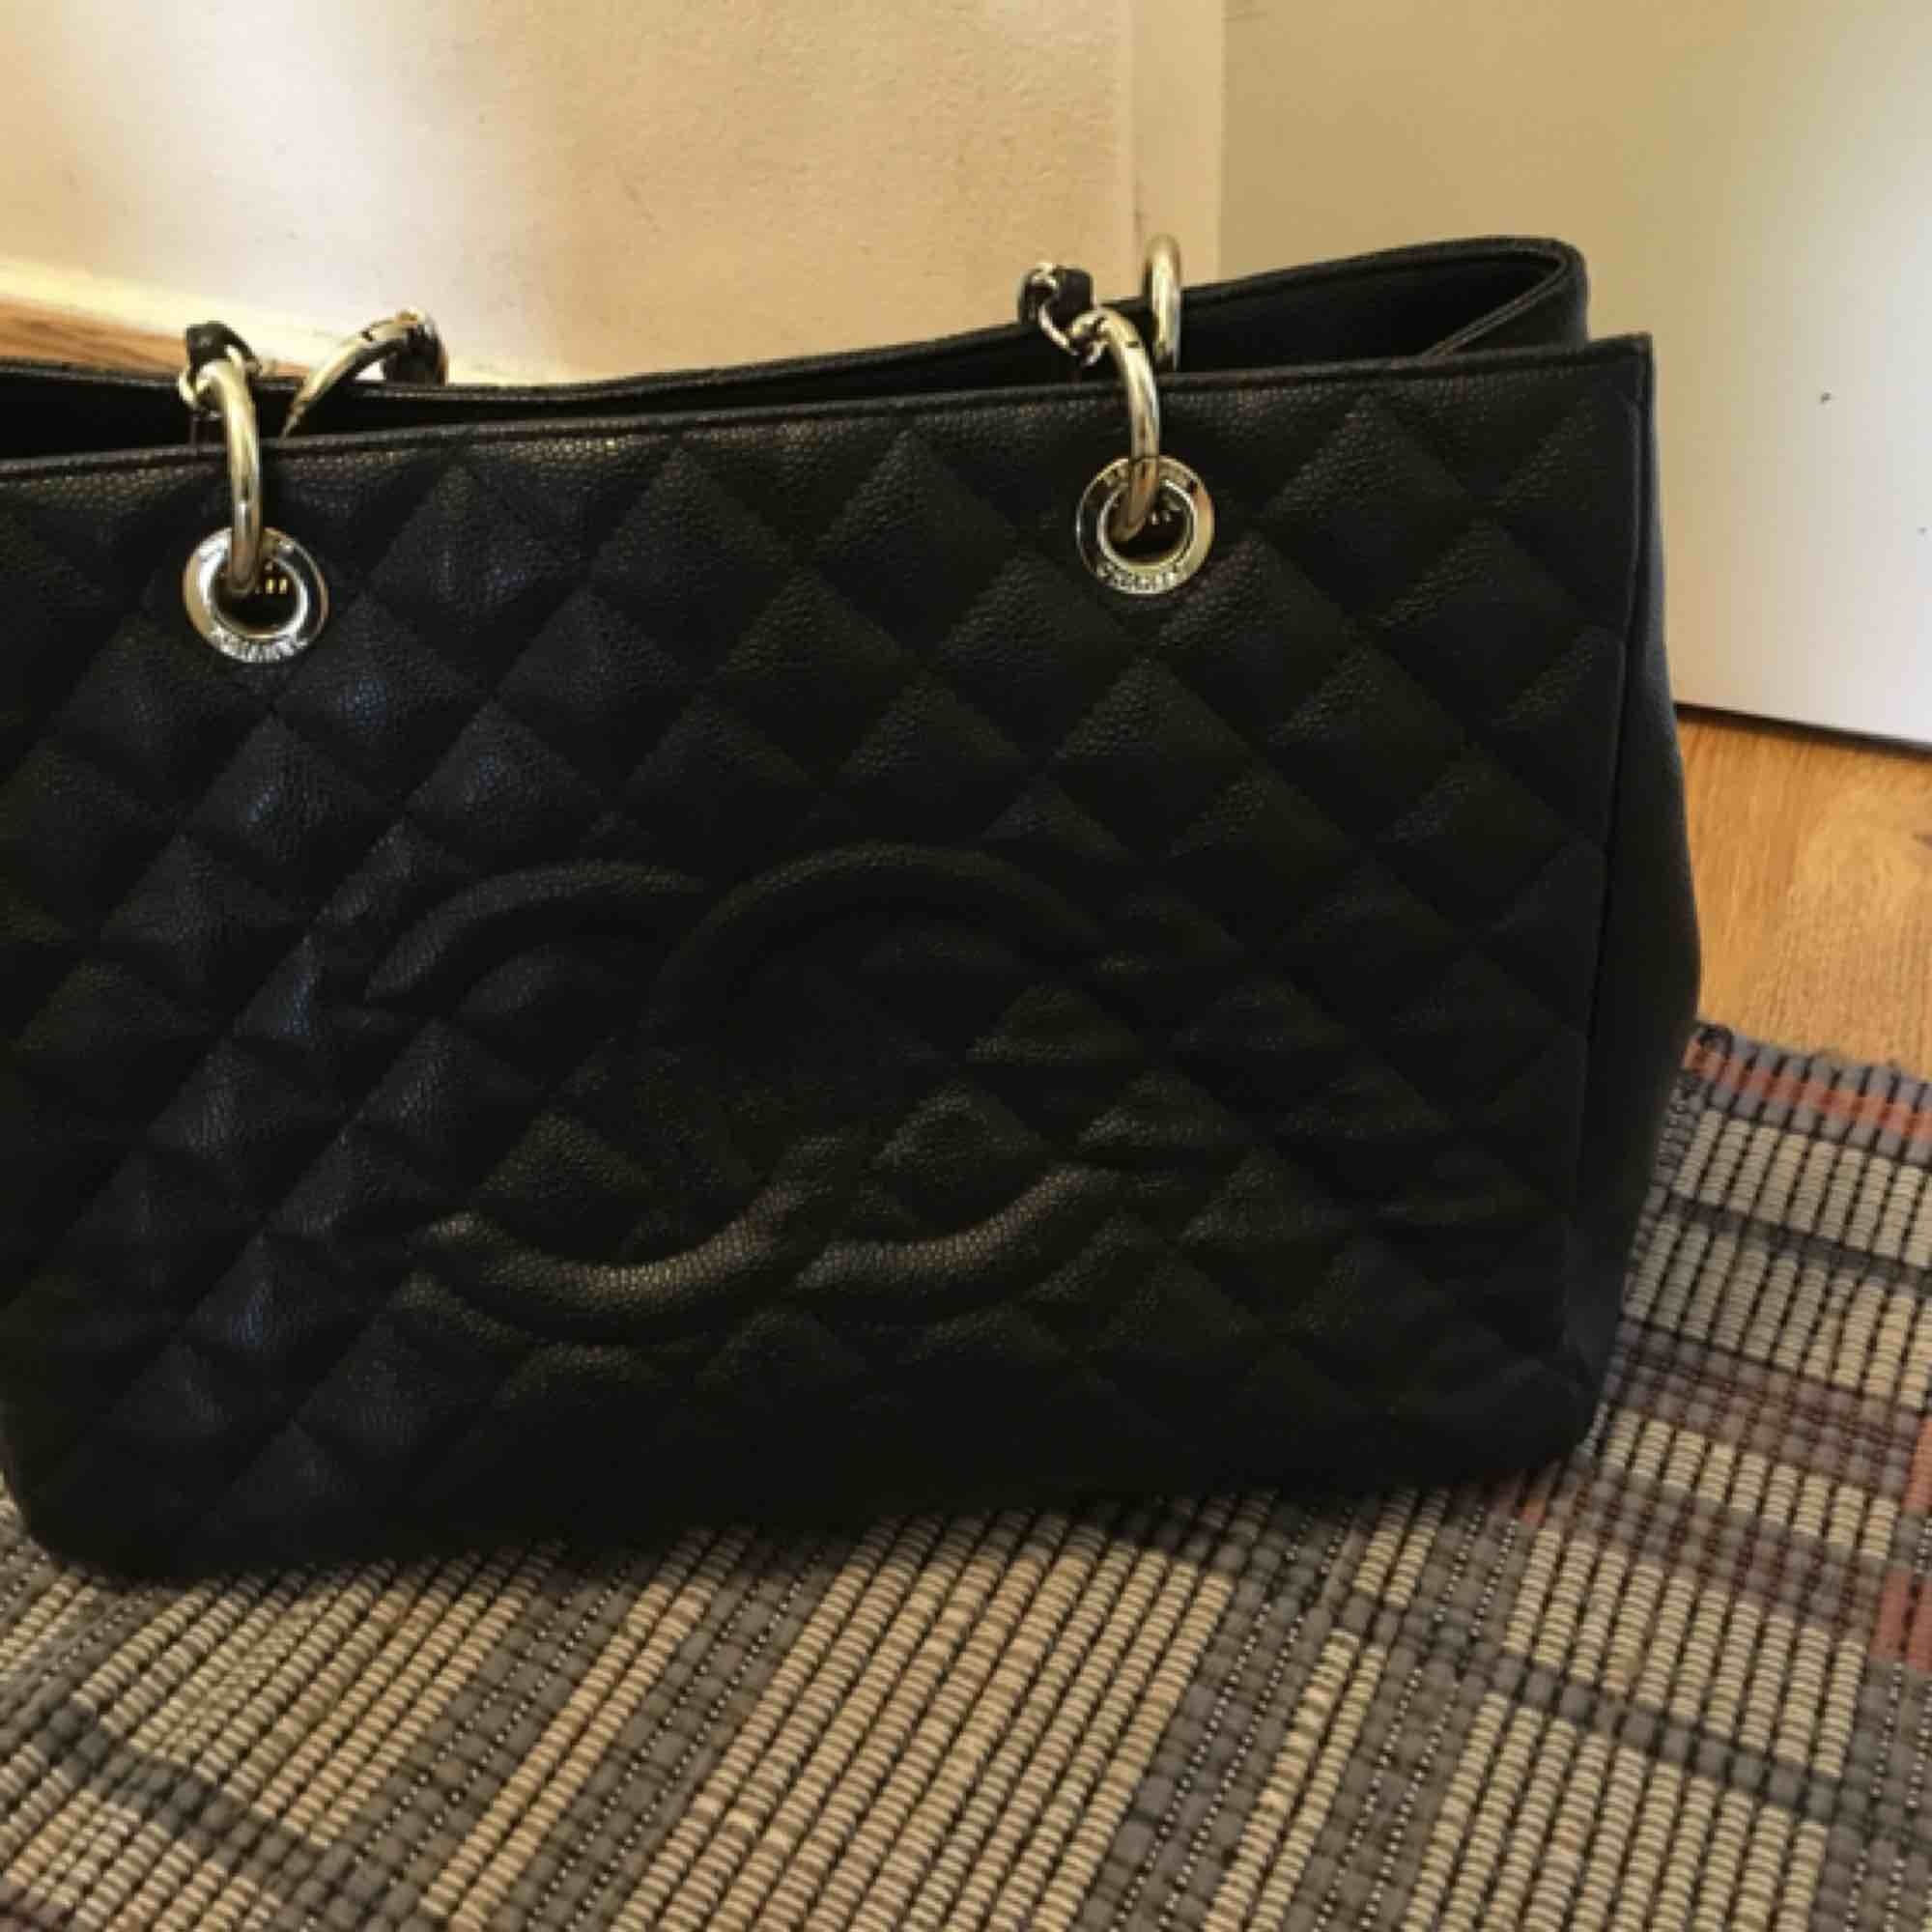 Chanel väska Kopia i kanon skick. . Accessoarer.